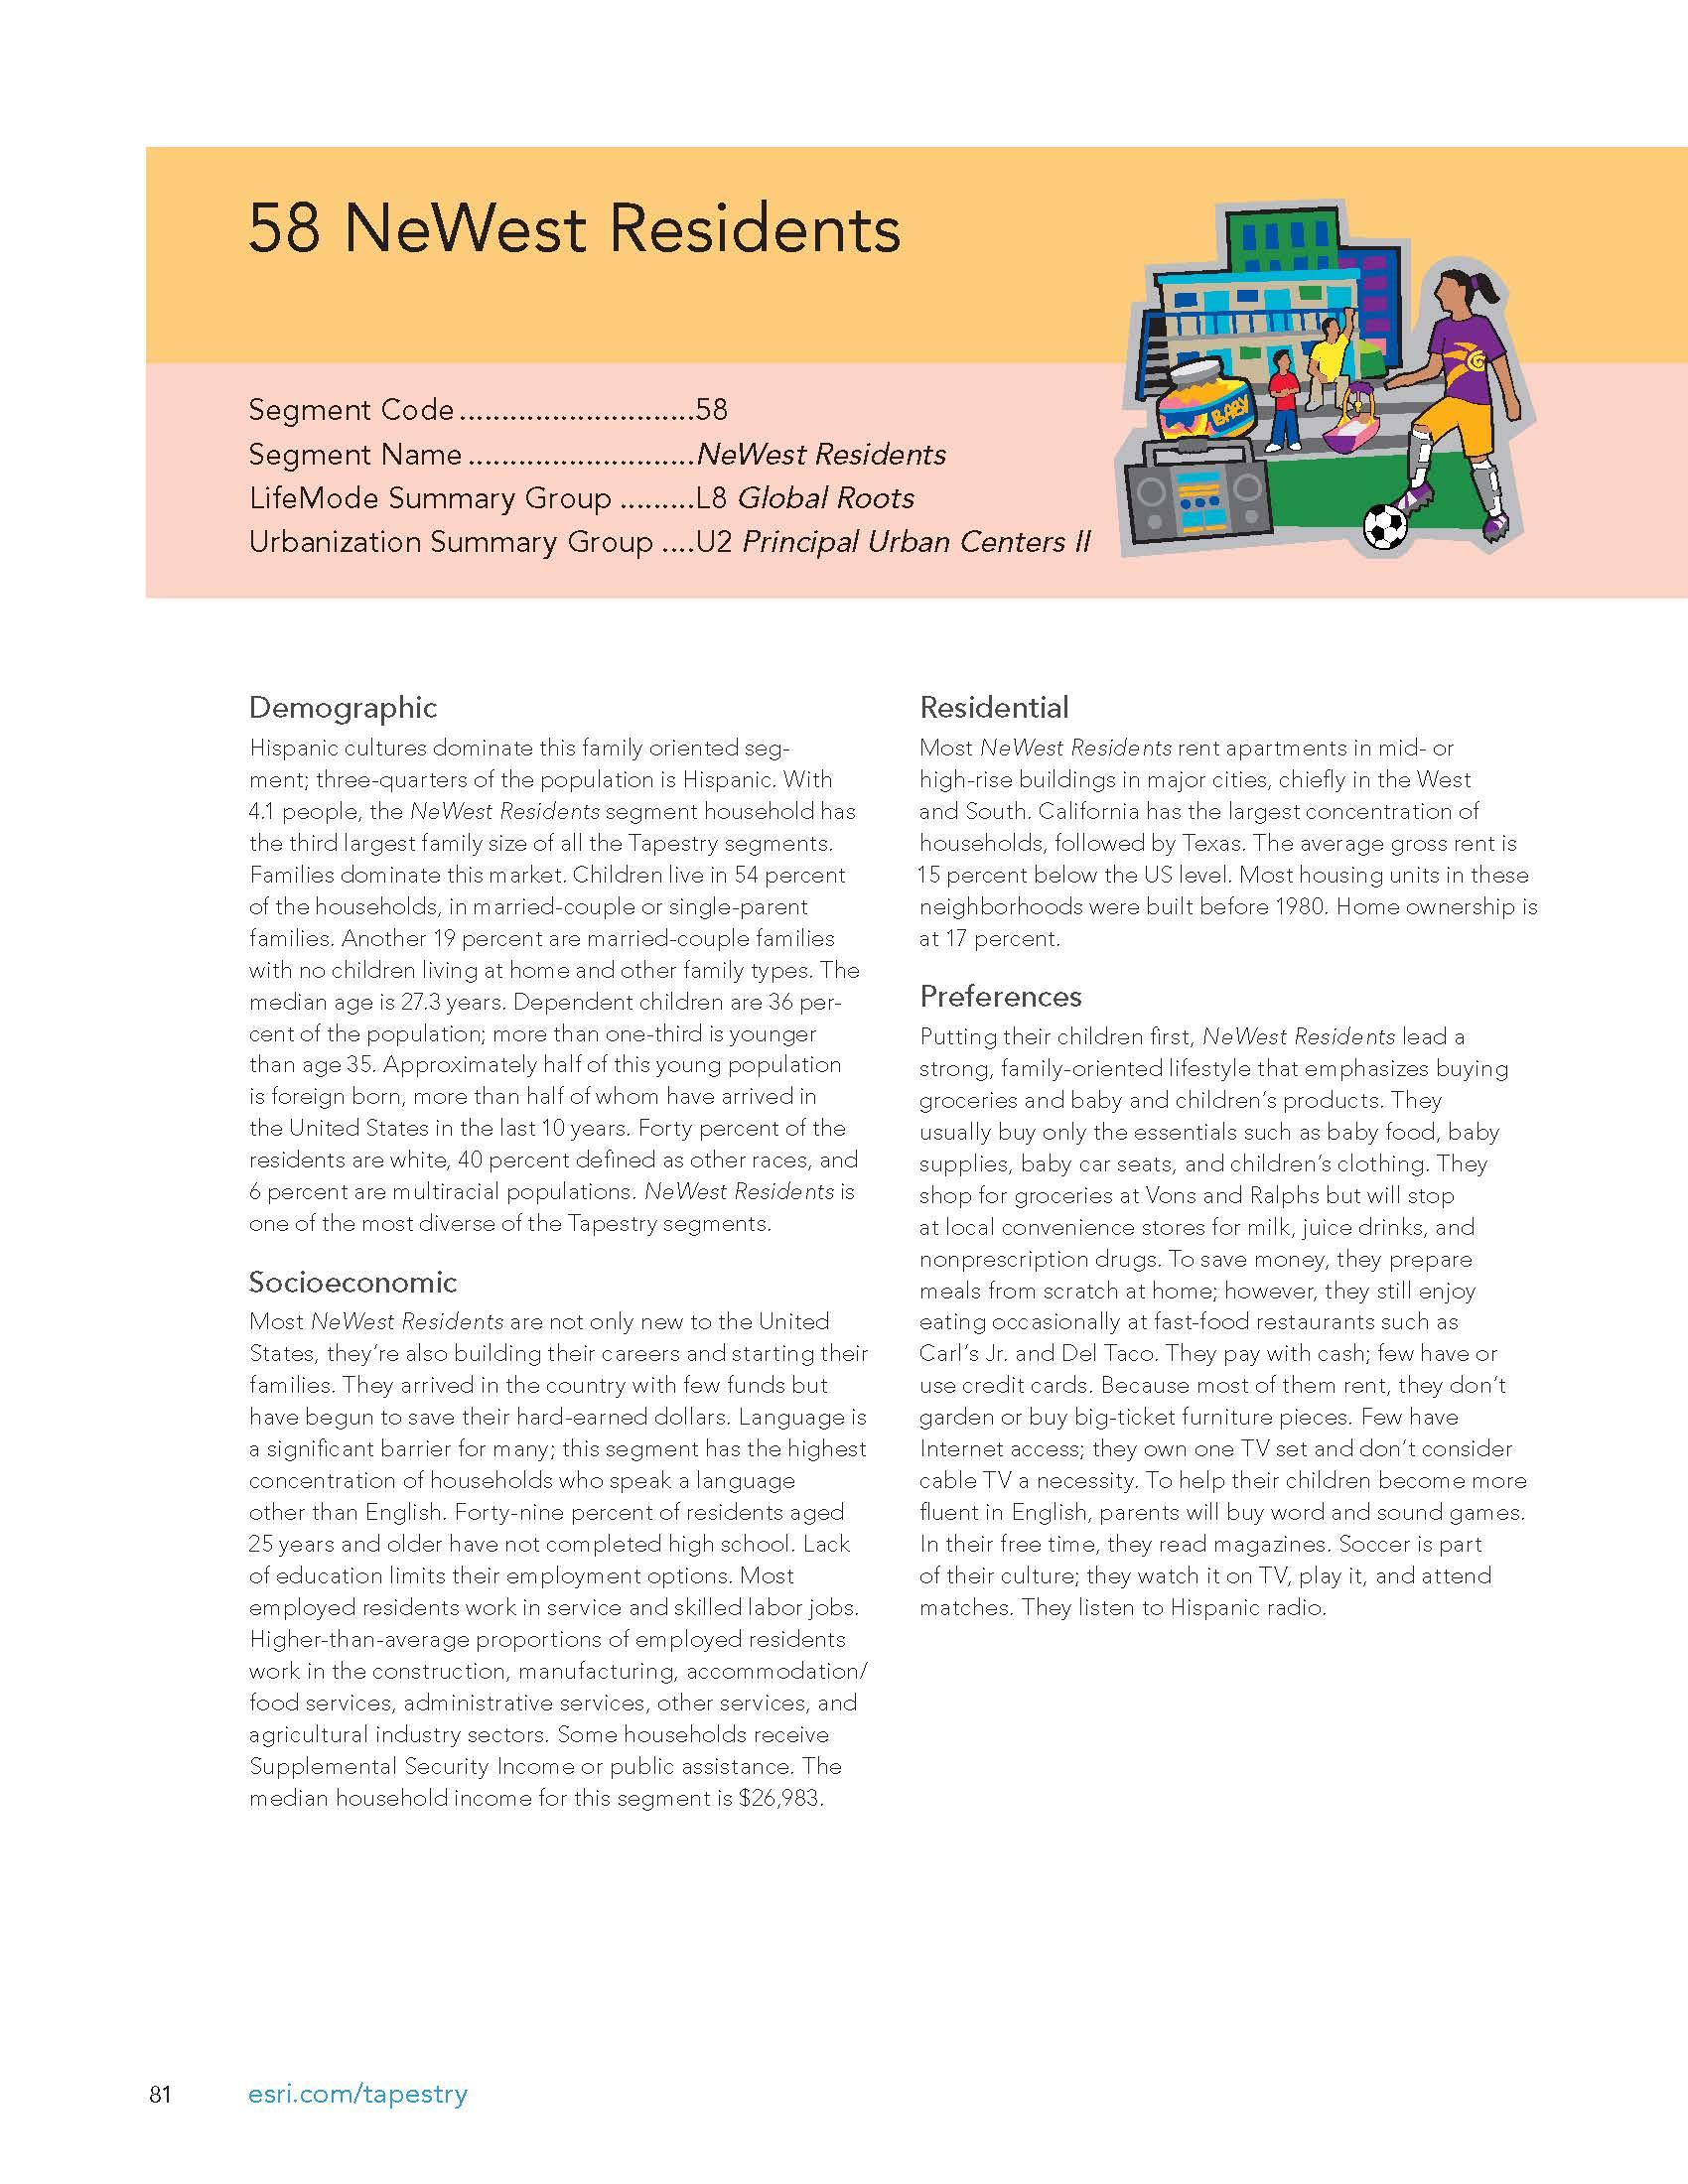 tapestry-segmentation_Page_84.jpg